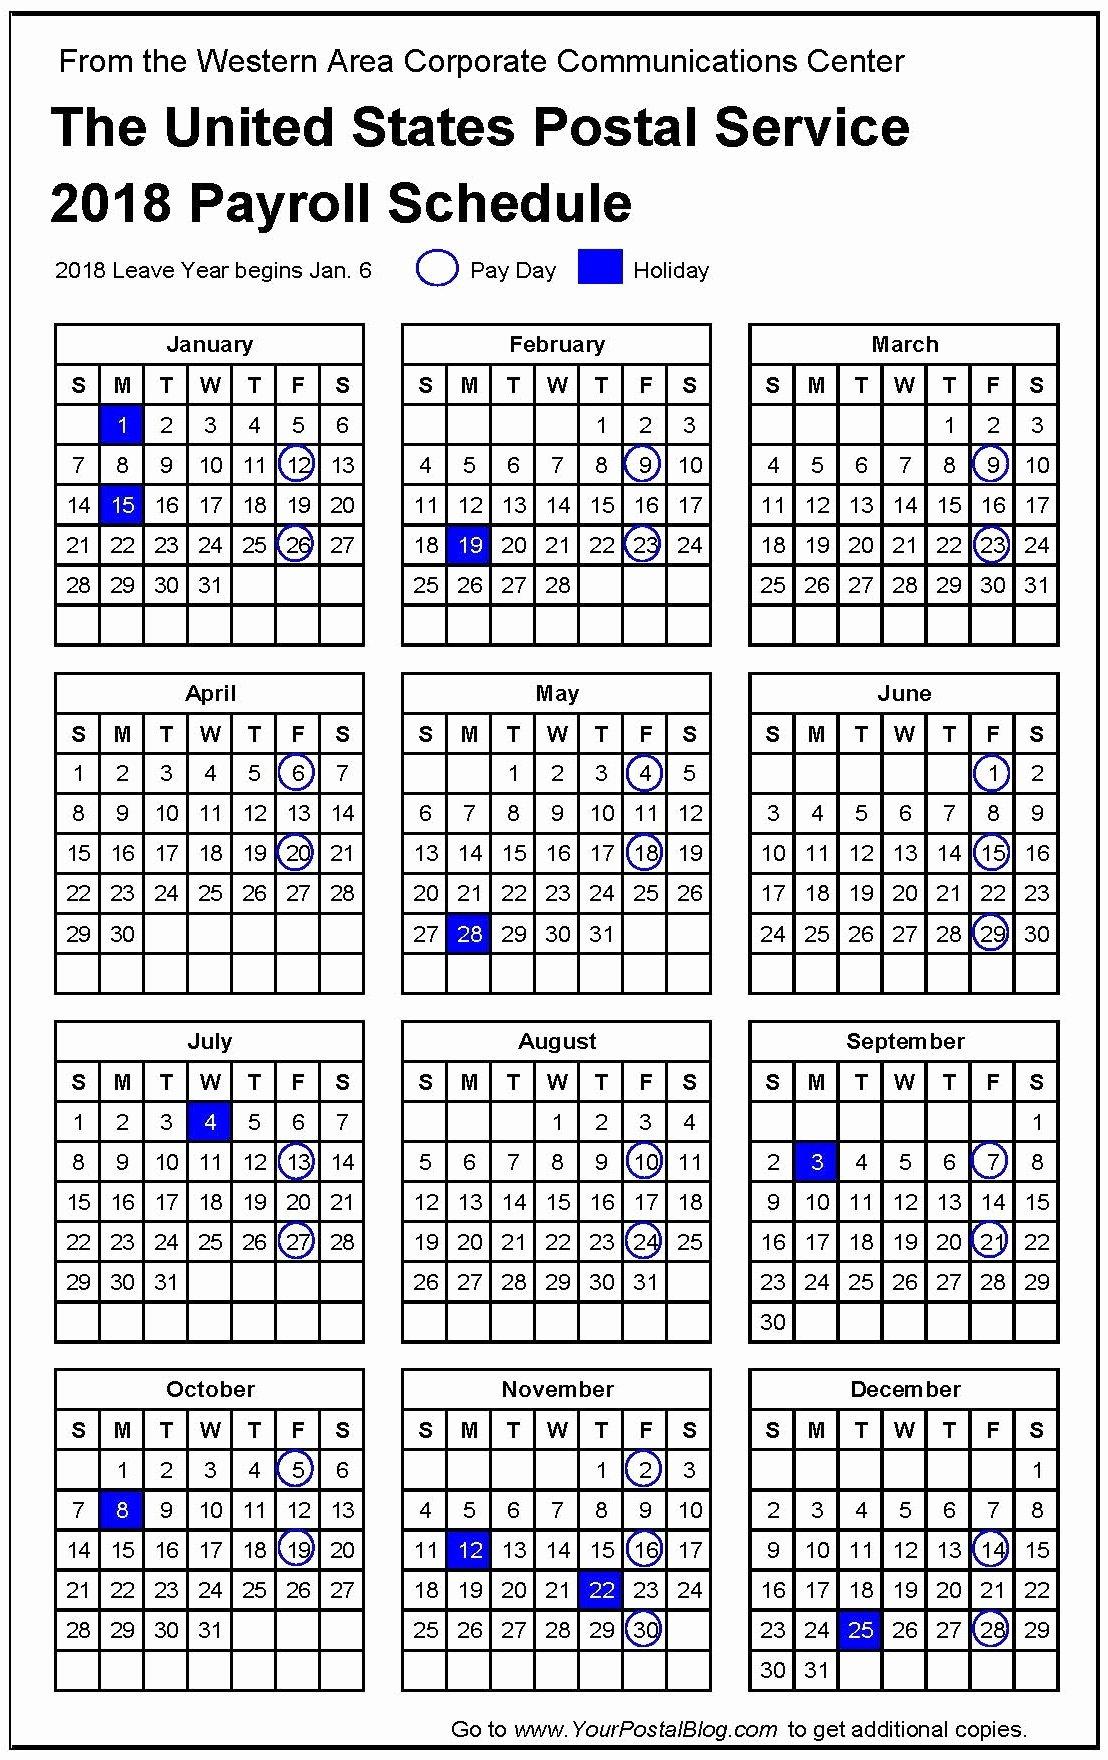 2019 Payroll Calendar Template Unique Usps Pay Period Calendar 2019 – Template Calendar Design